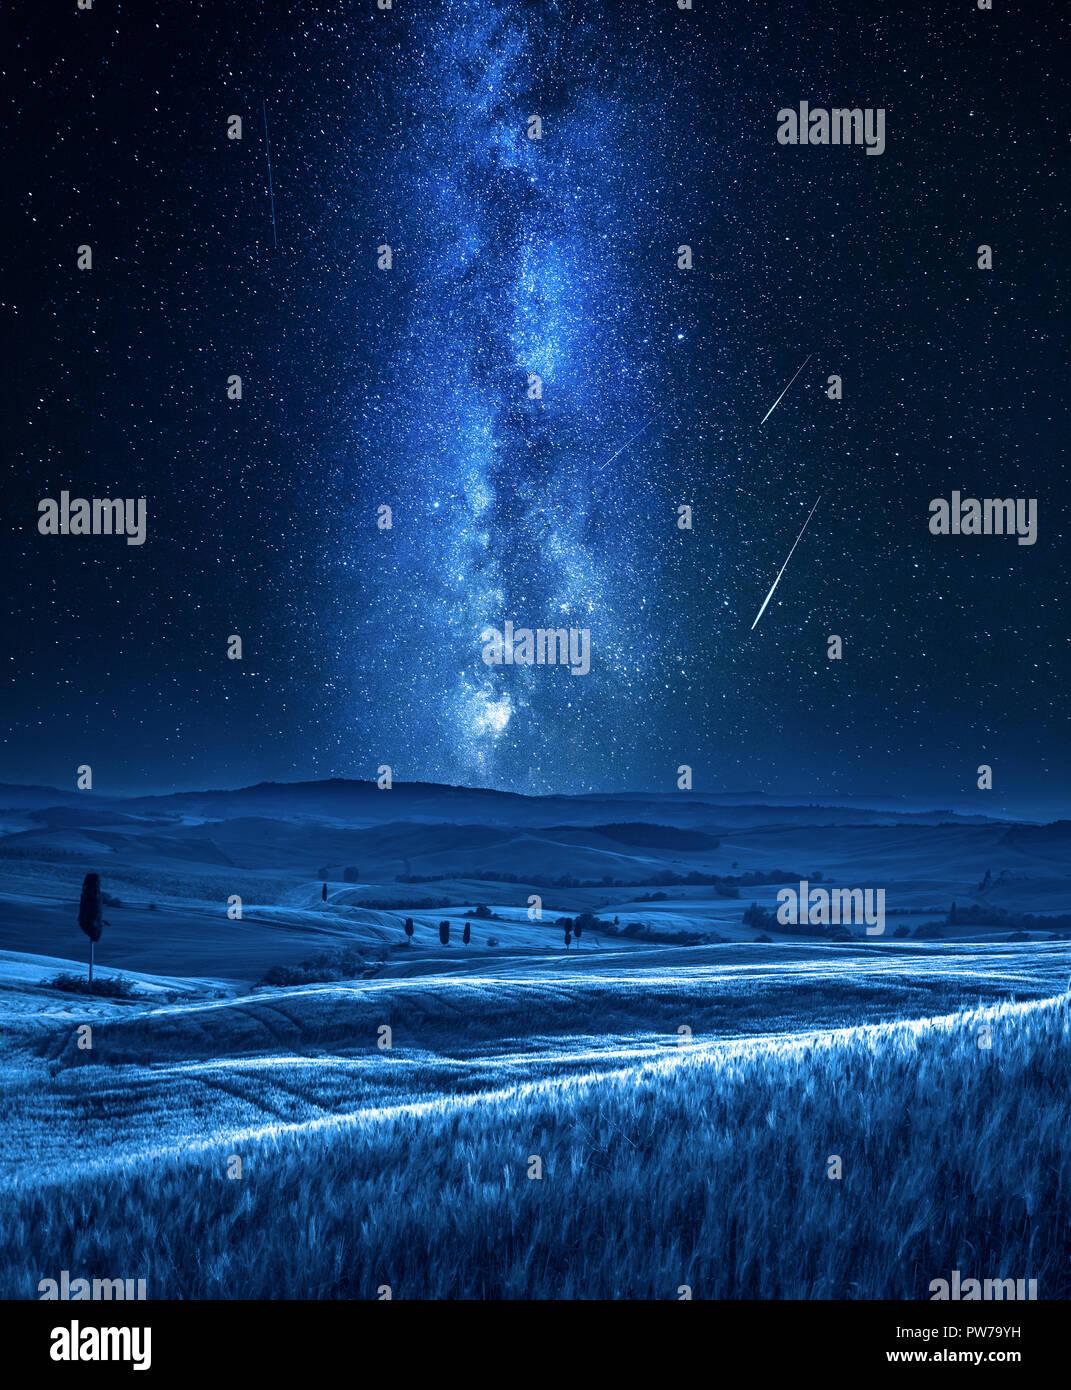 Milky way and falling stars in Tuscany at night, Italy Stock Photo